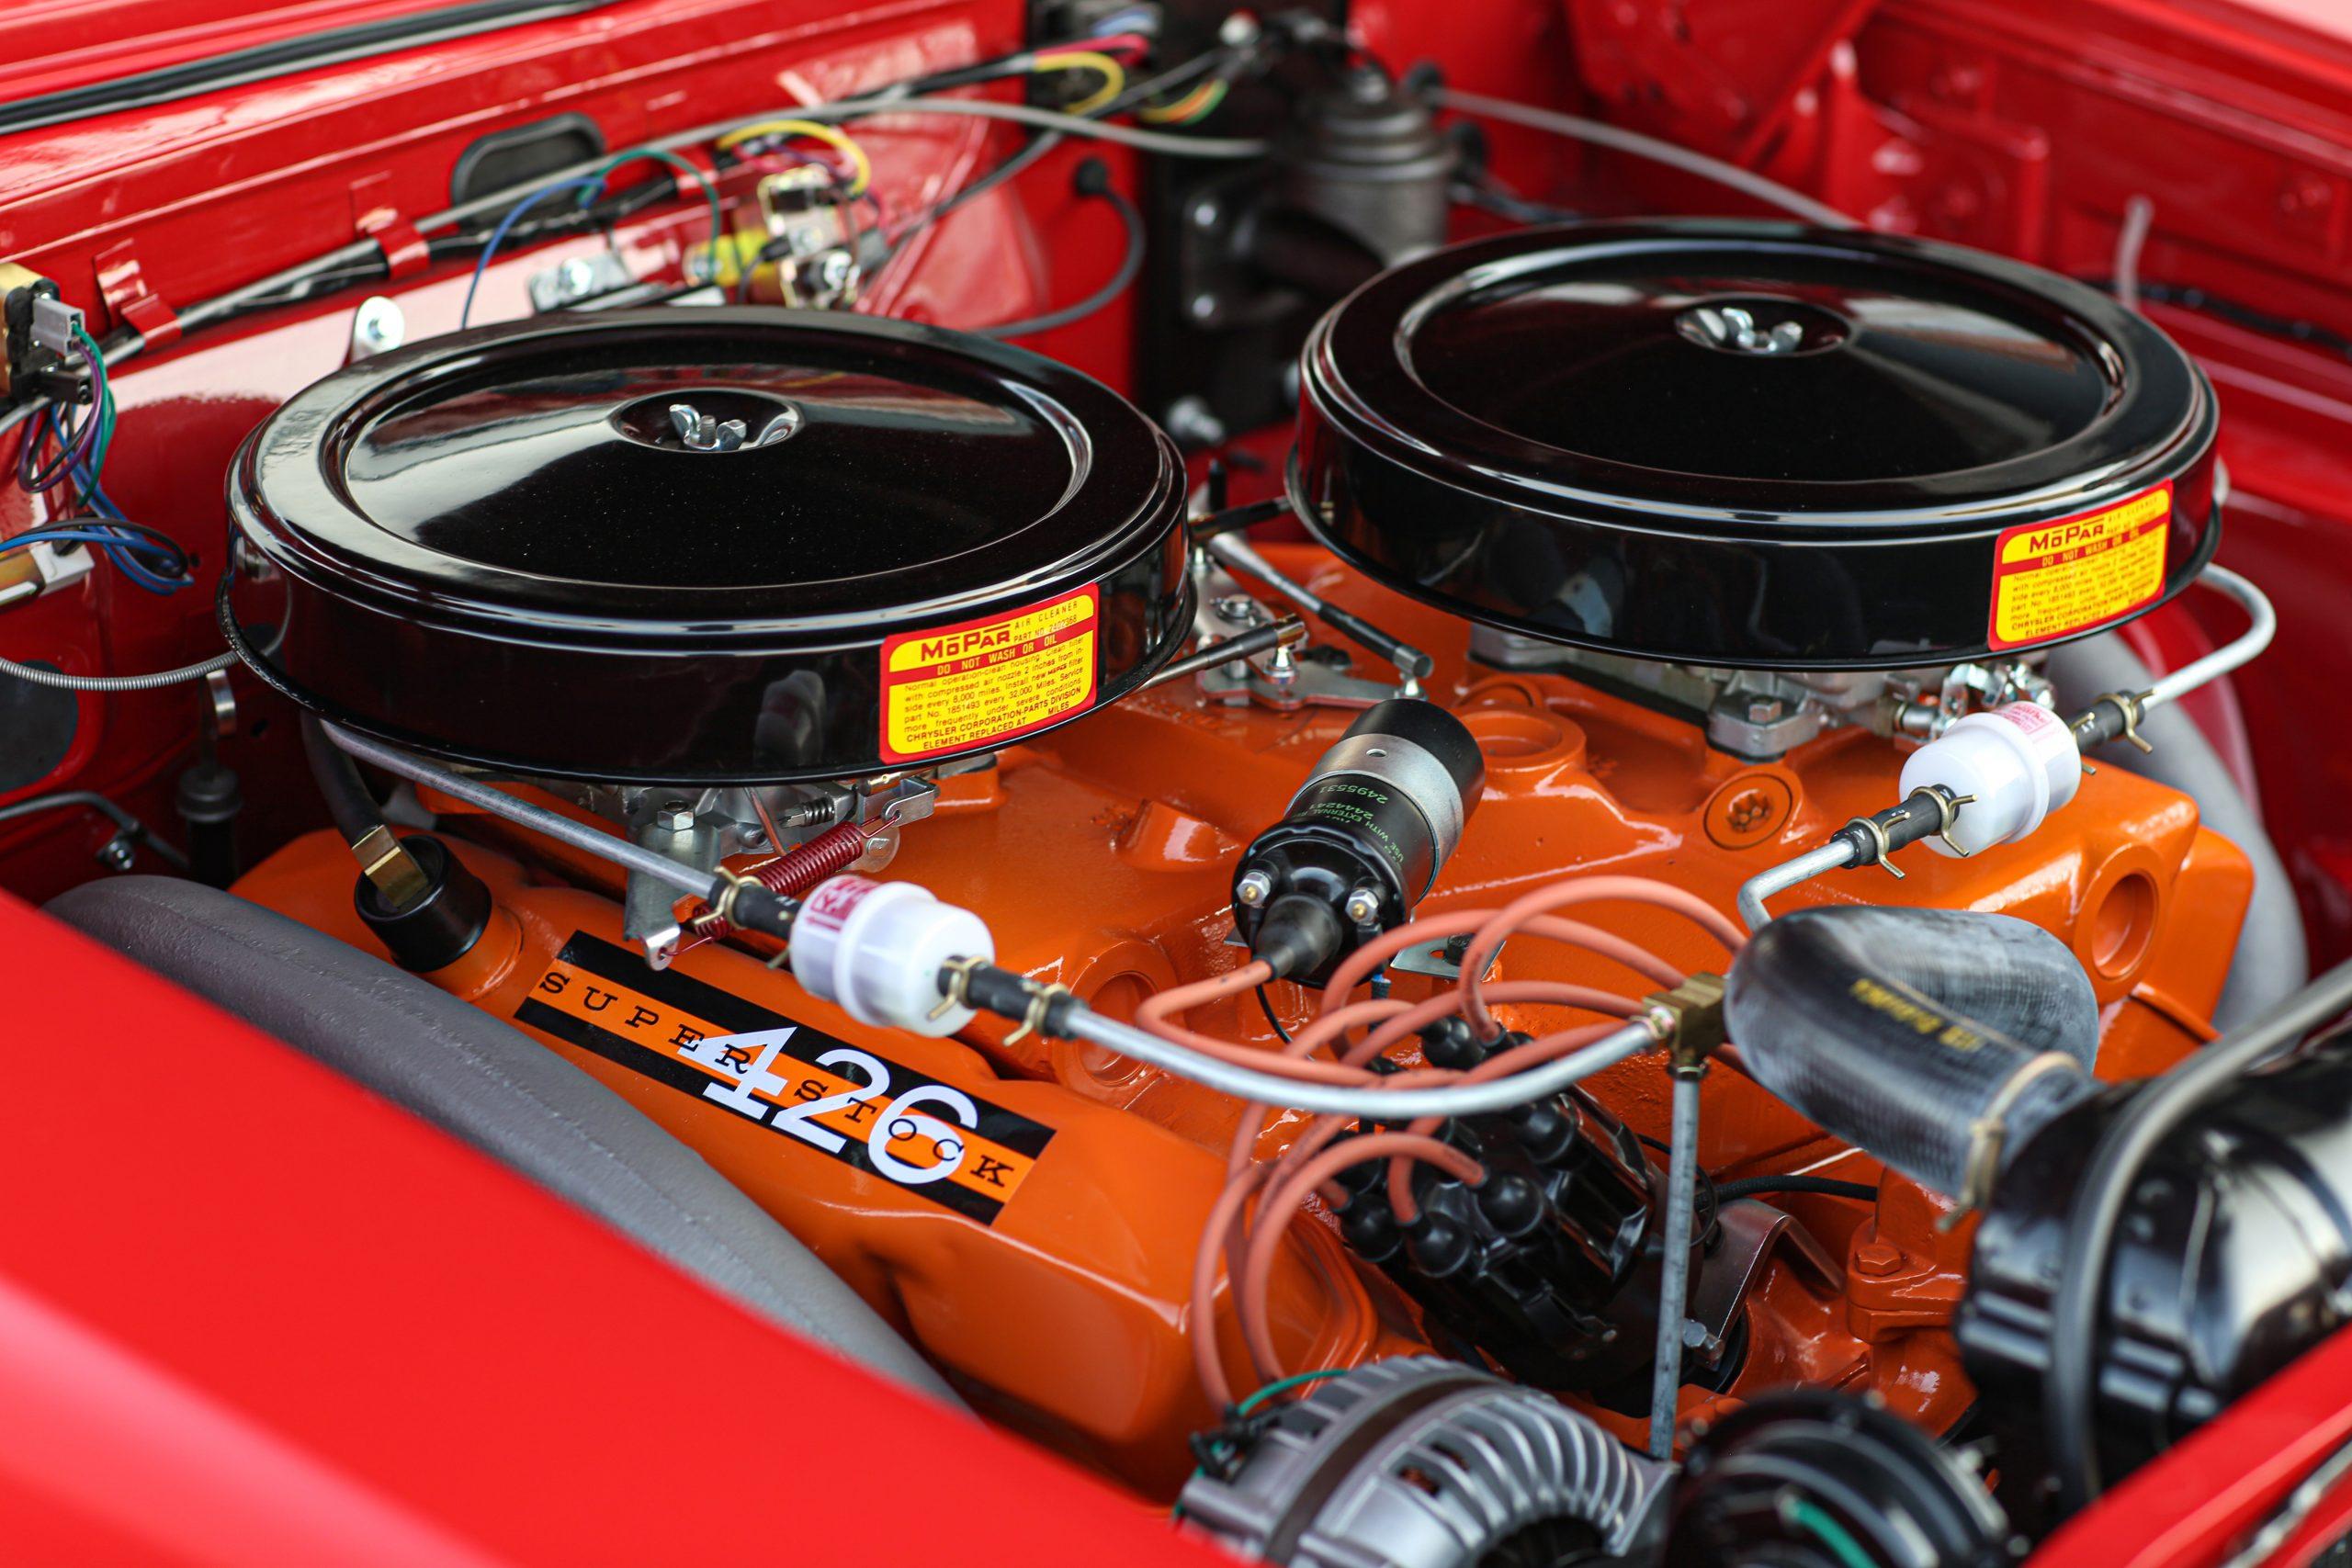 1963 Plymouth 426 Max Wedge lightweight crossram